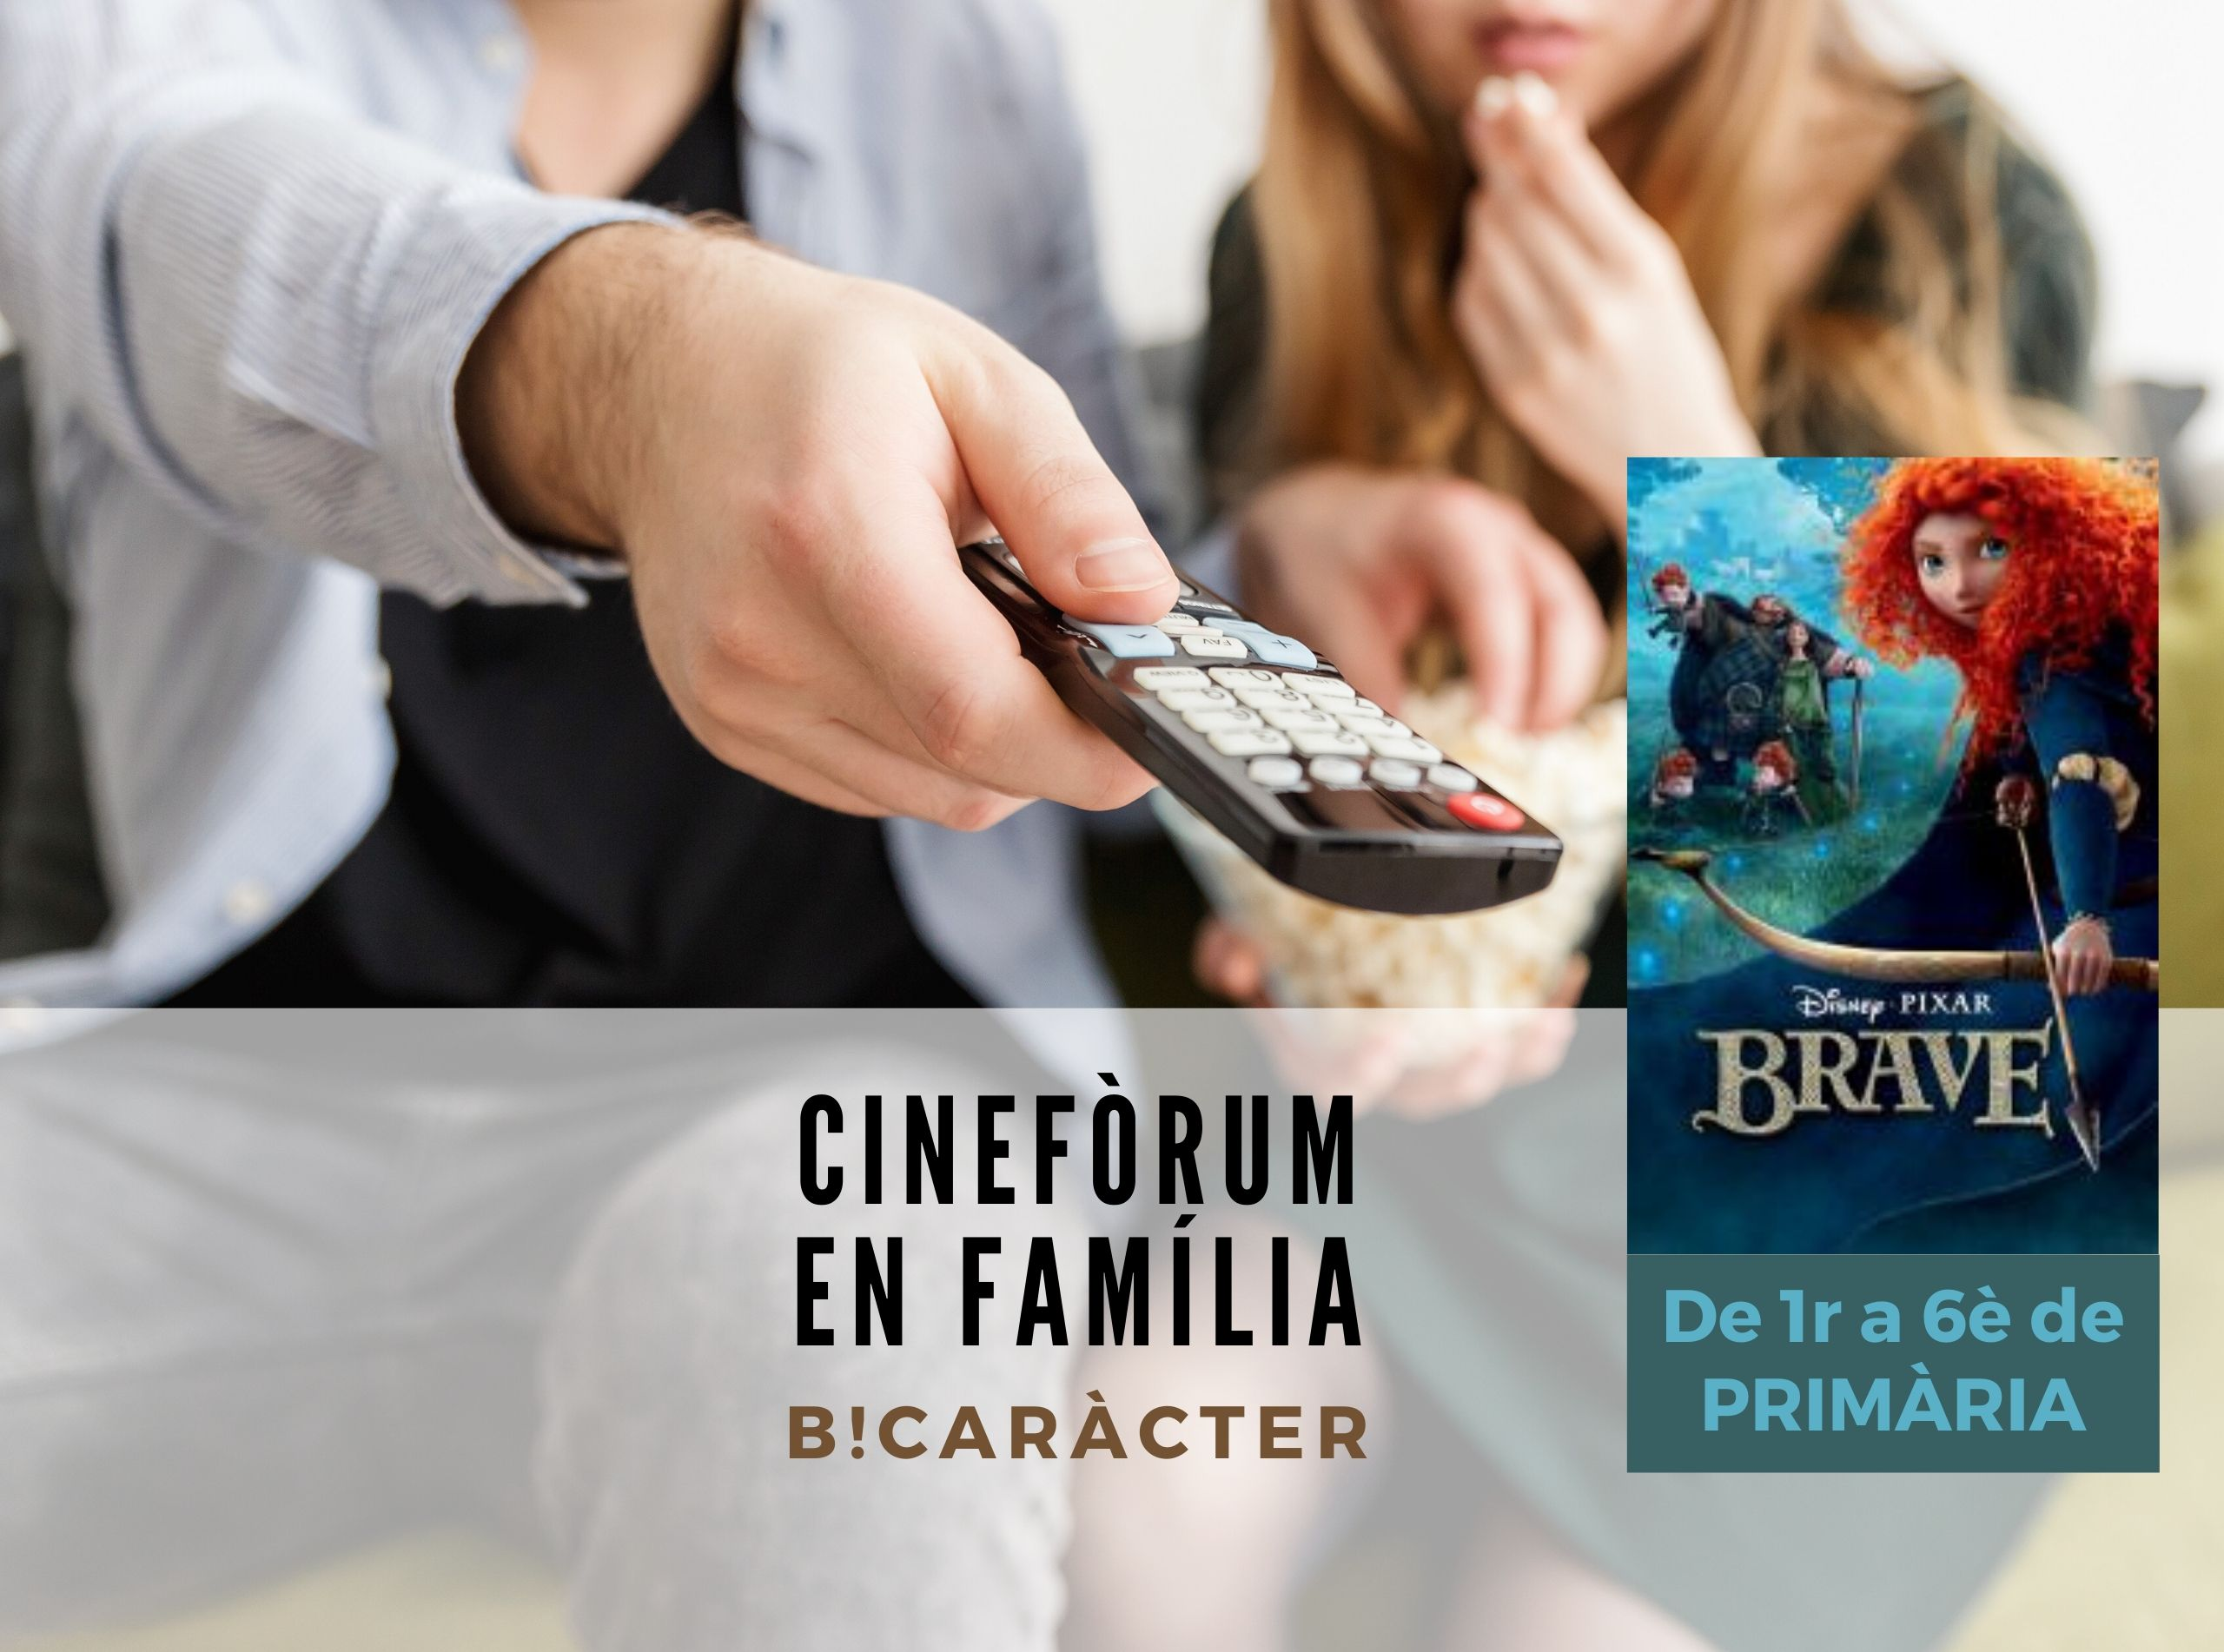 Cinefòrum en família per a Primària: Brave